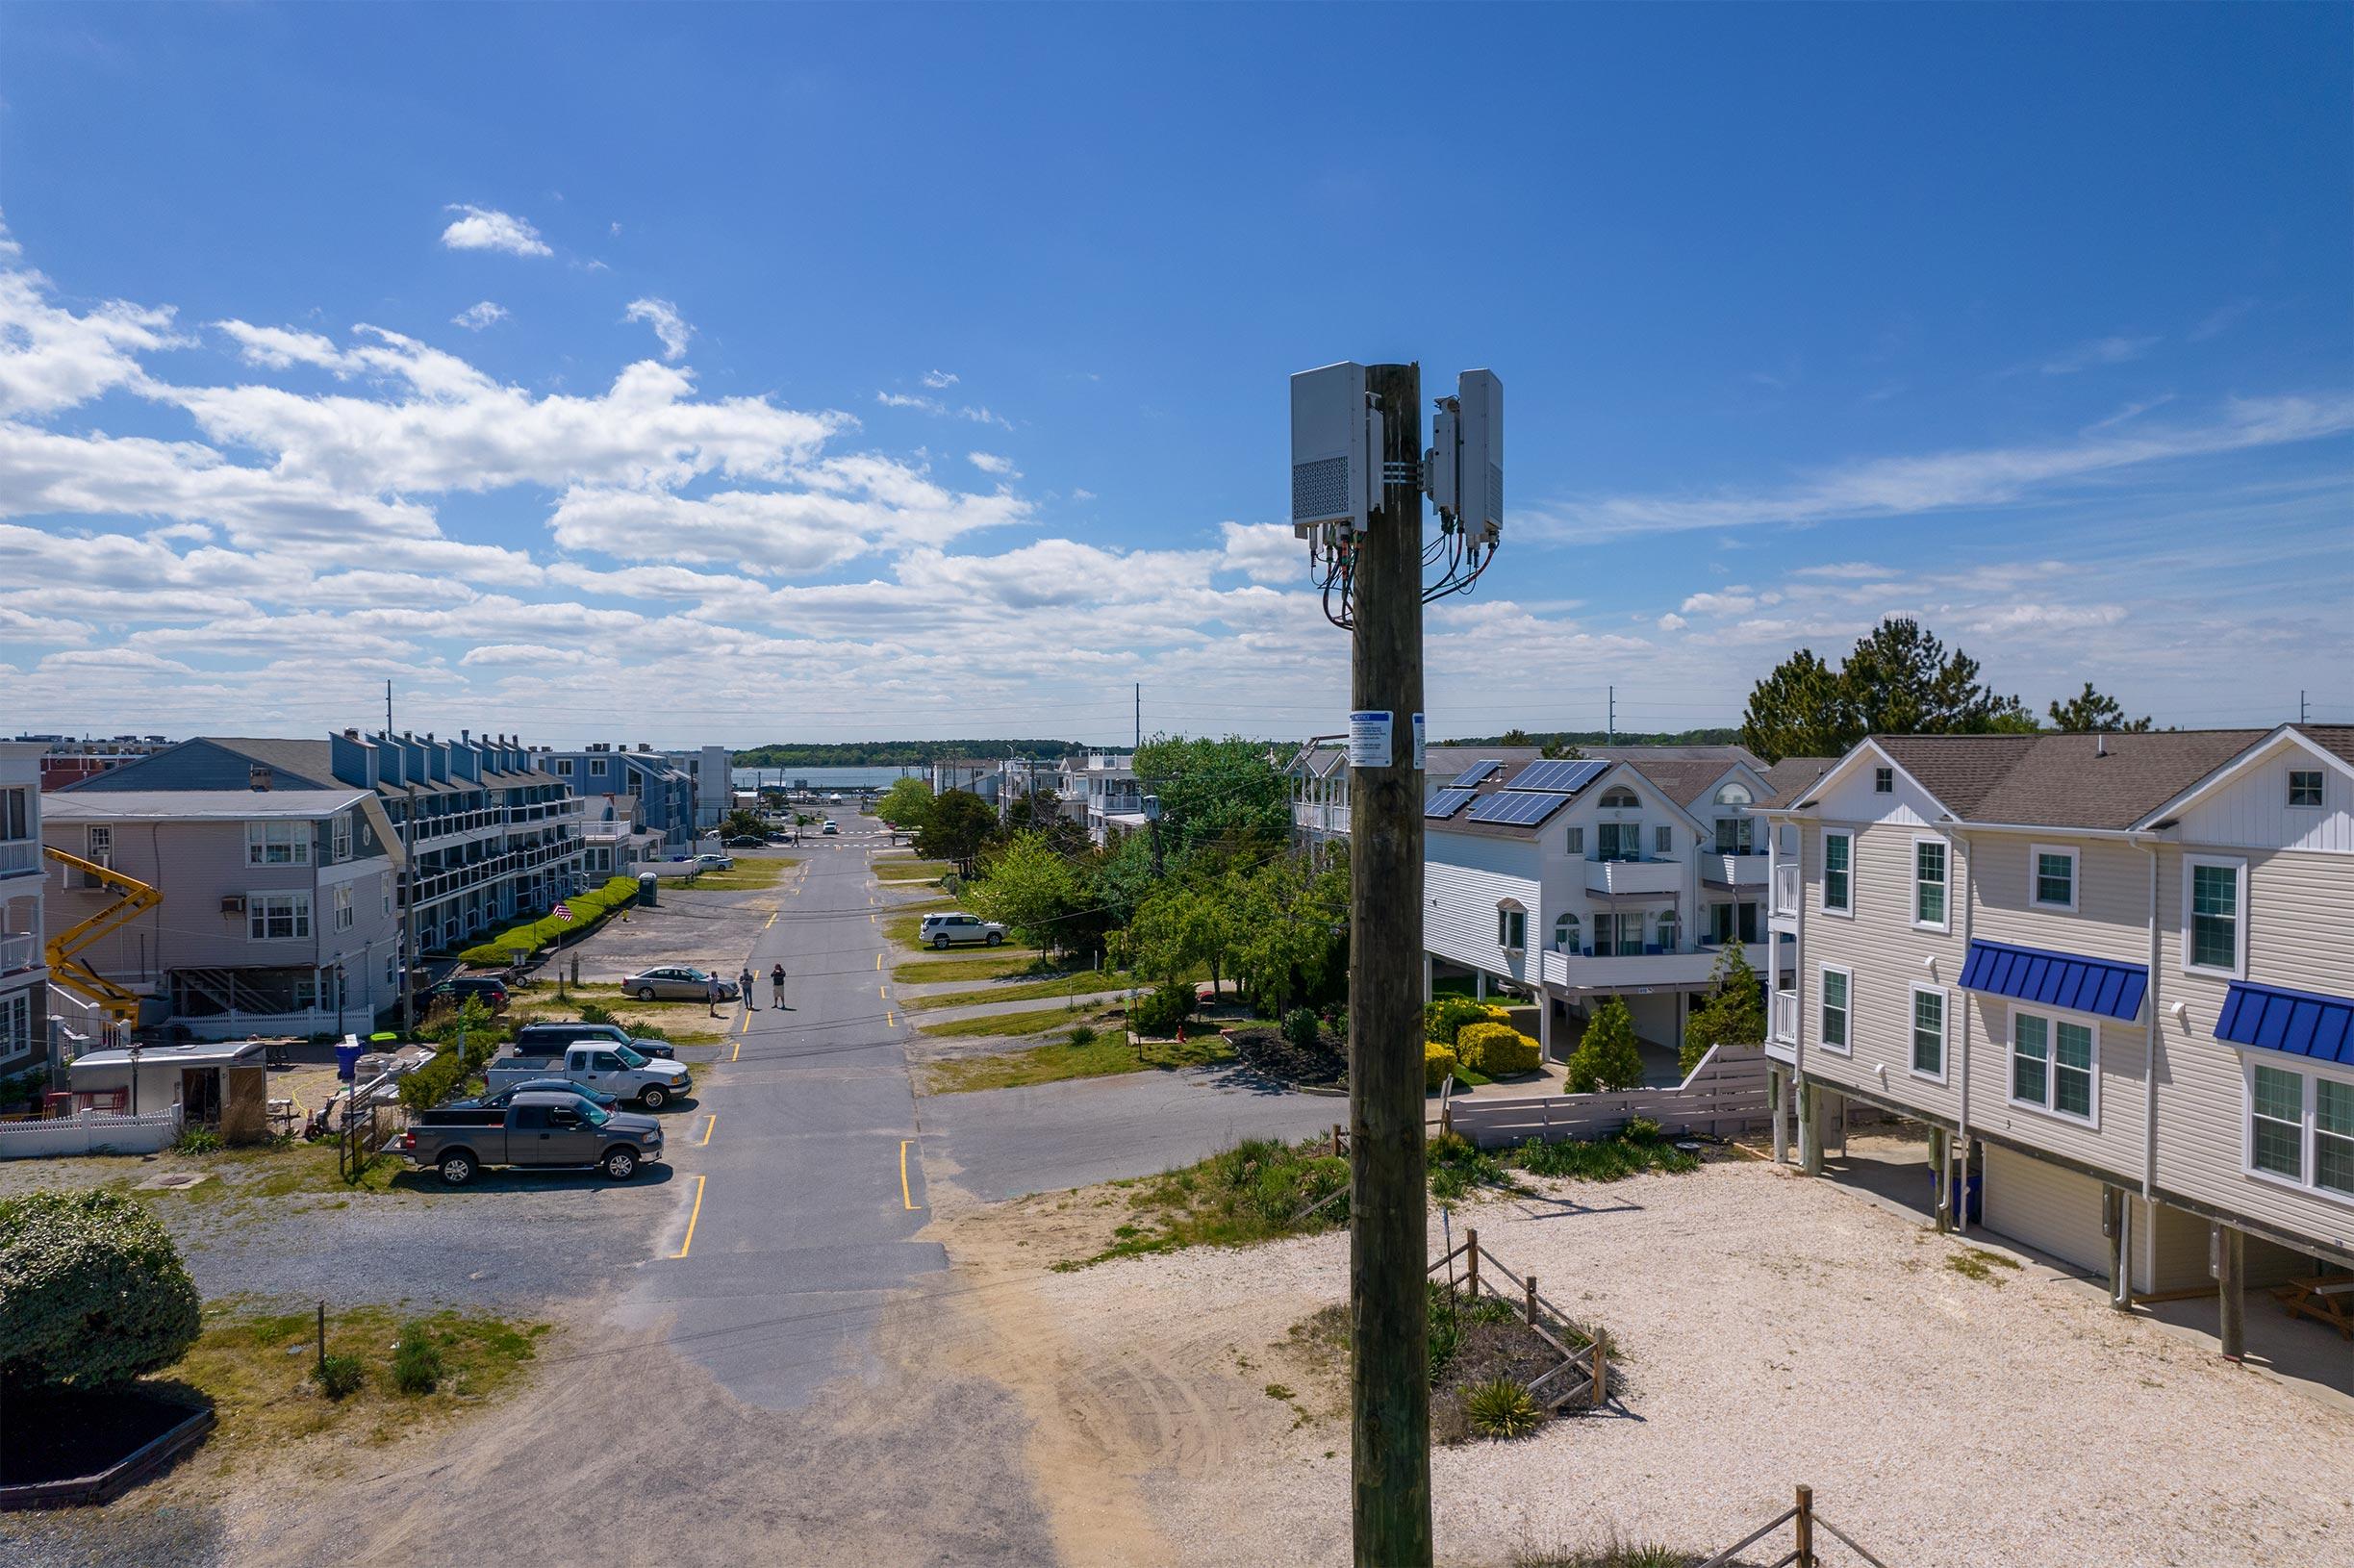 dewey beach 5G tower